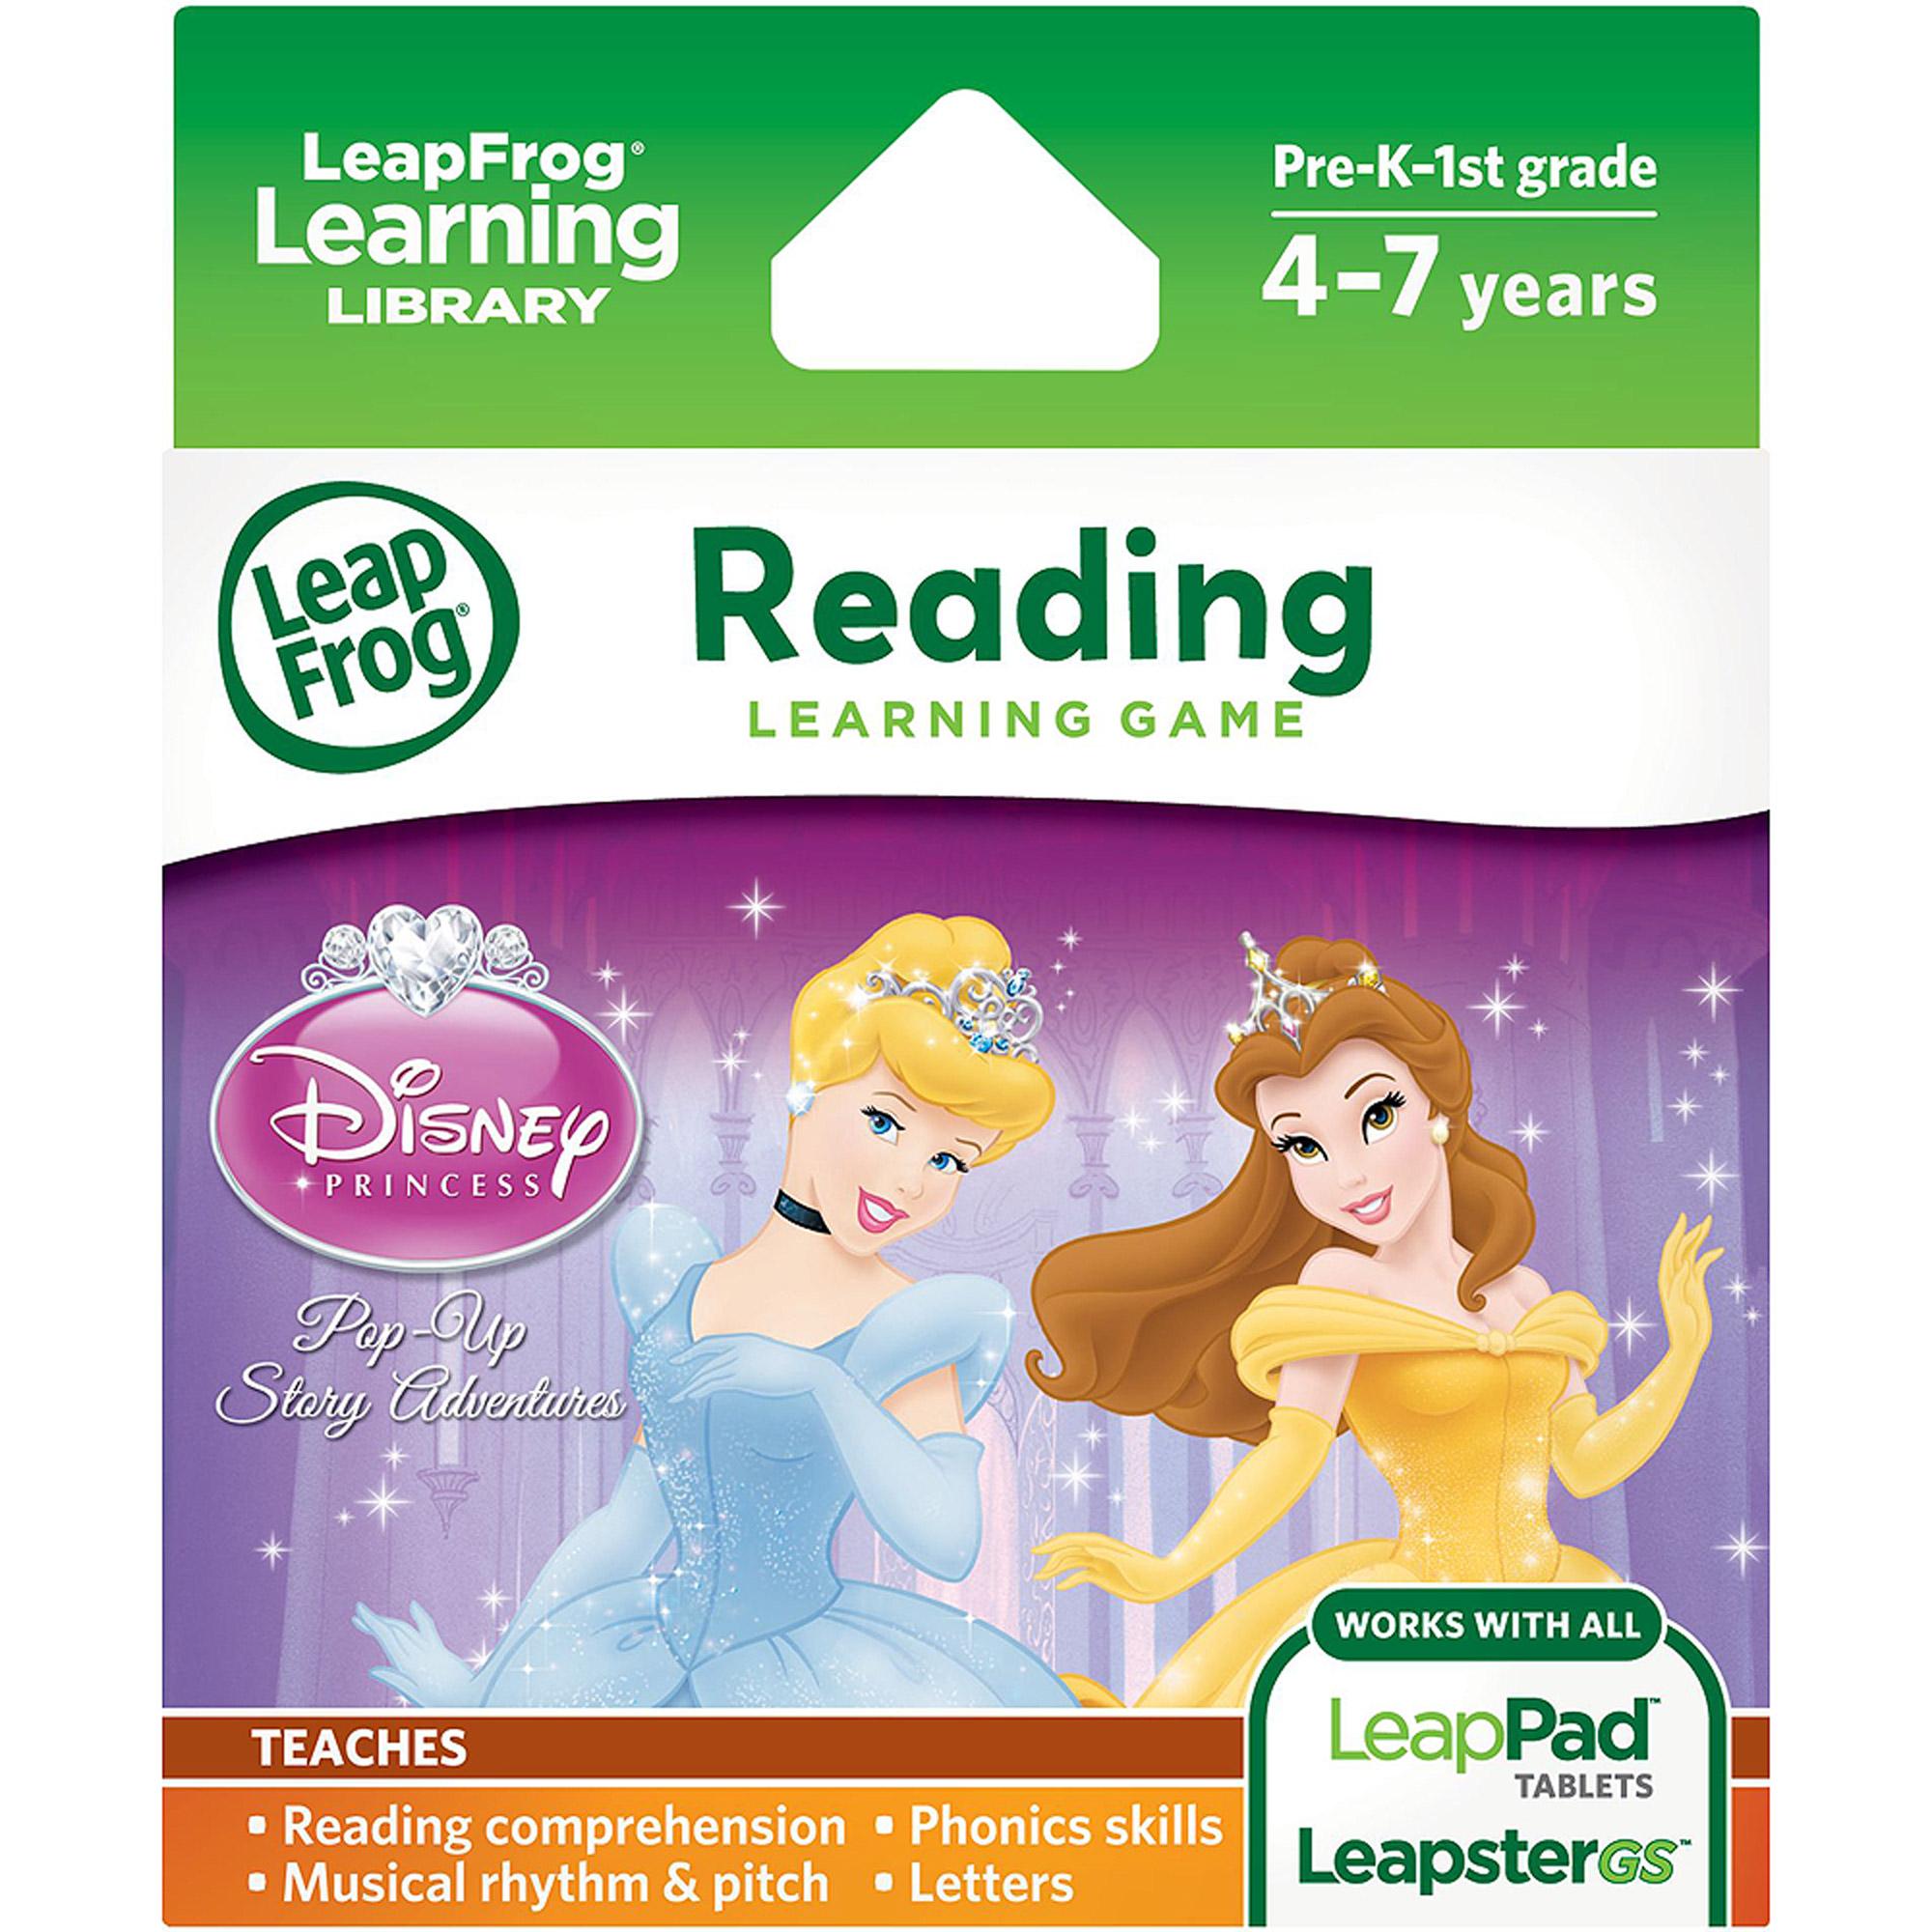 LeapFrog Explorer & LeapPad Learning Game: Disney Princess: Pop-Up Story Adventures